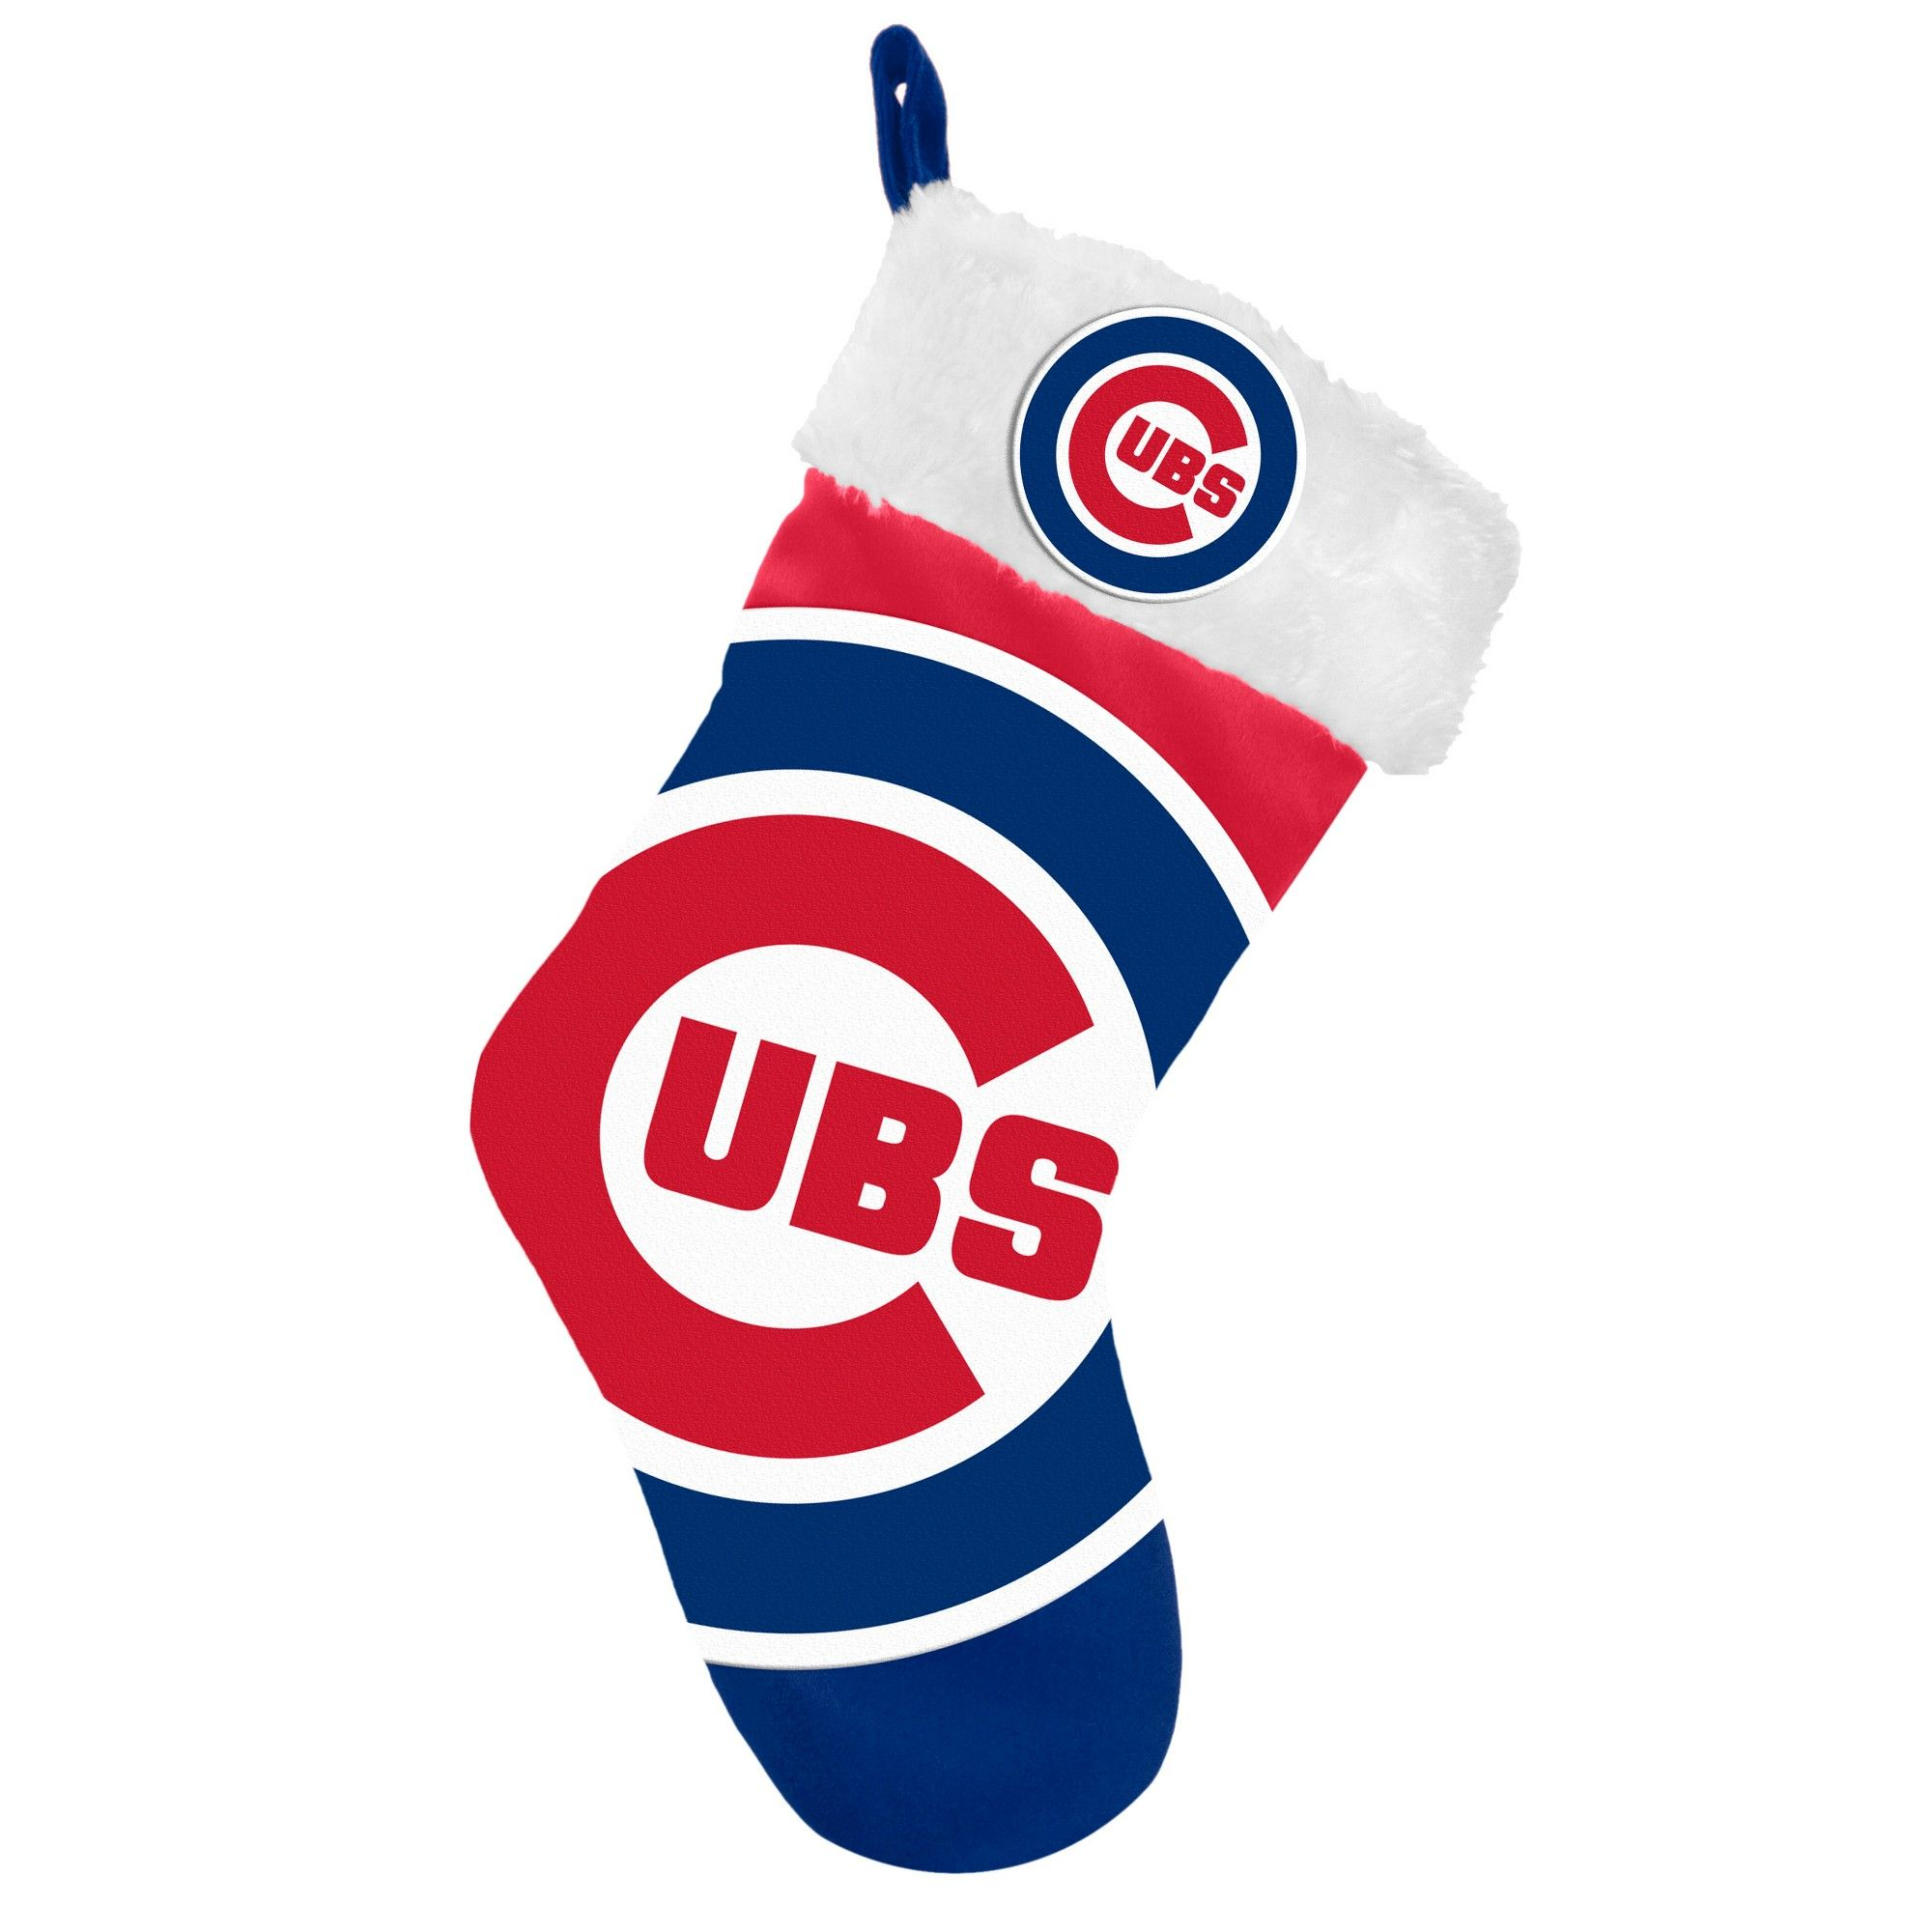 adad20d70f8 MLB Chicago Cubs Stocking